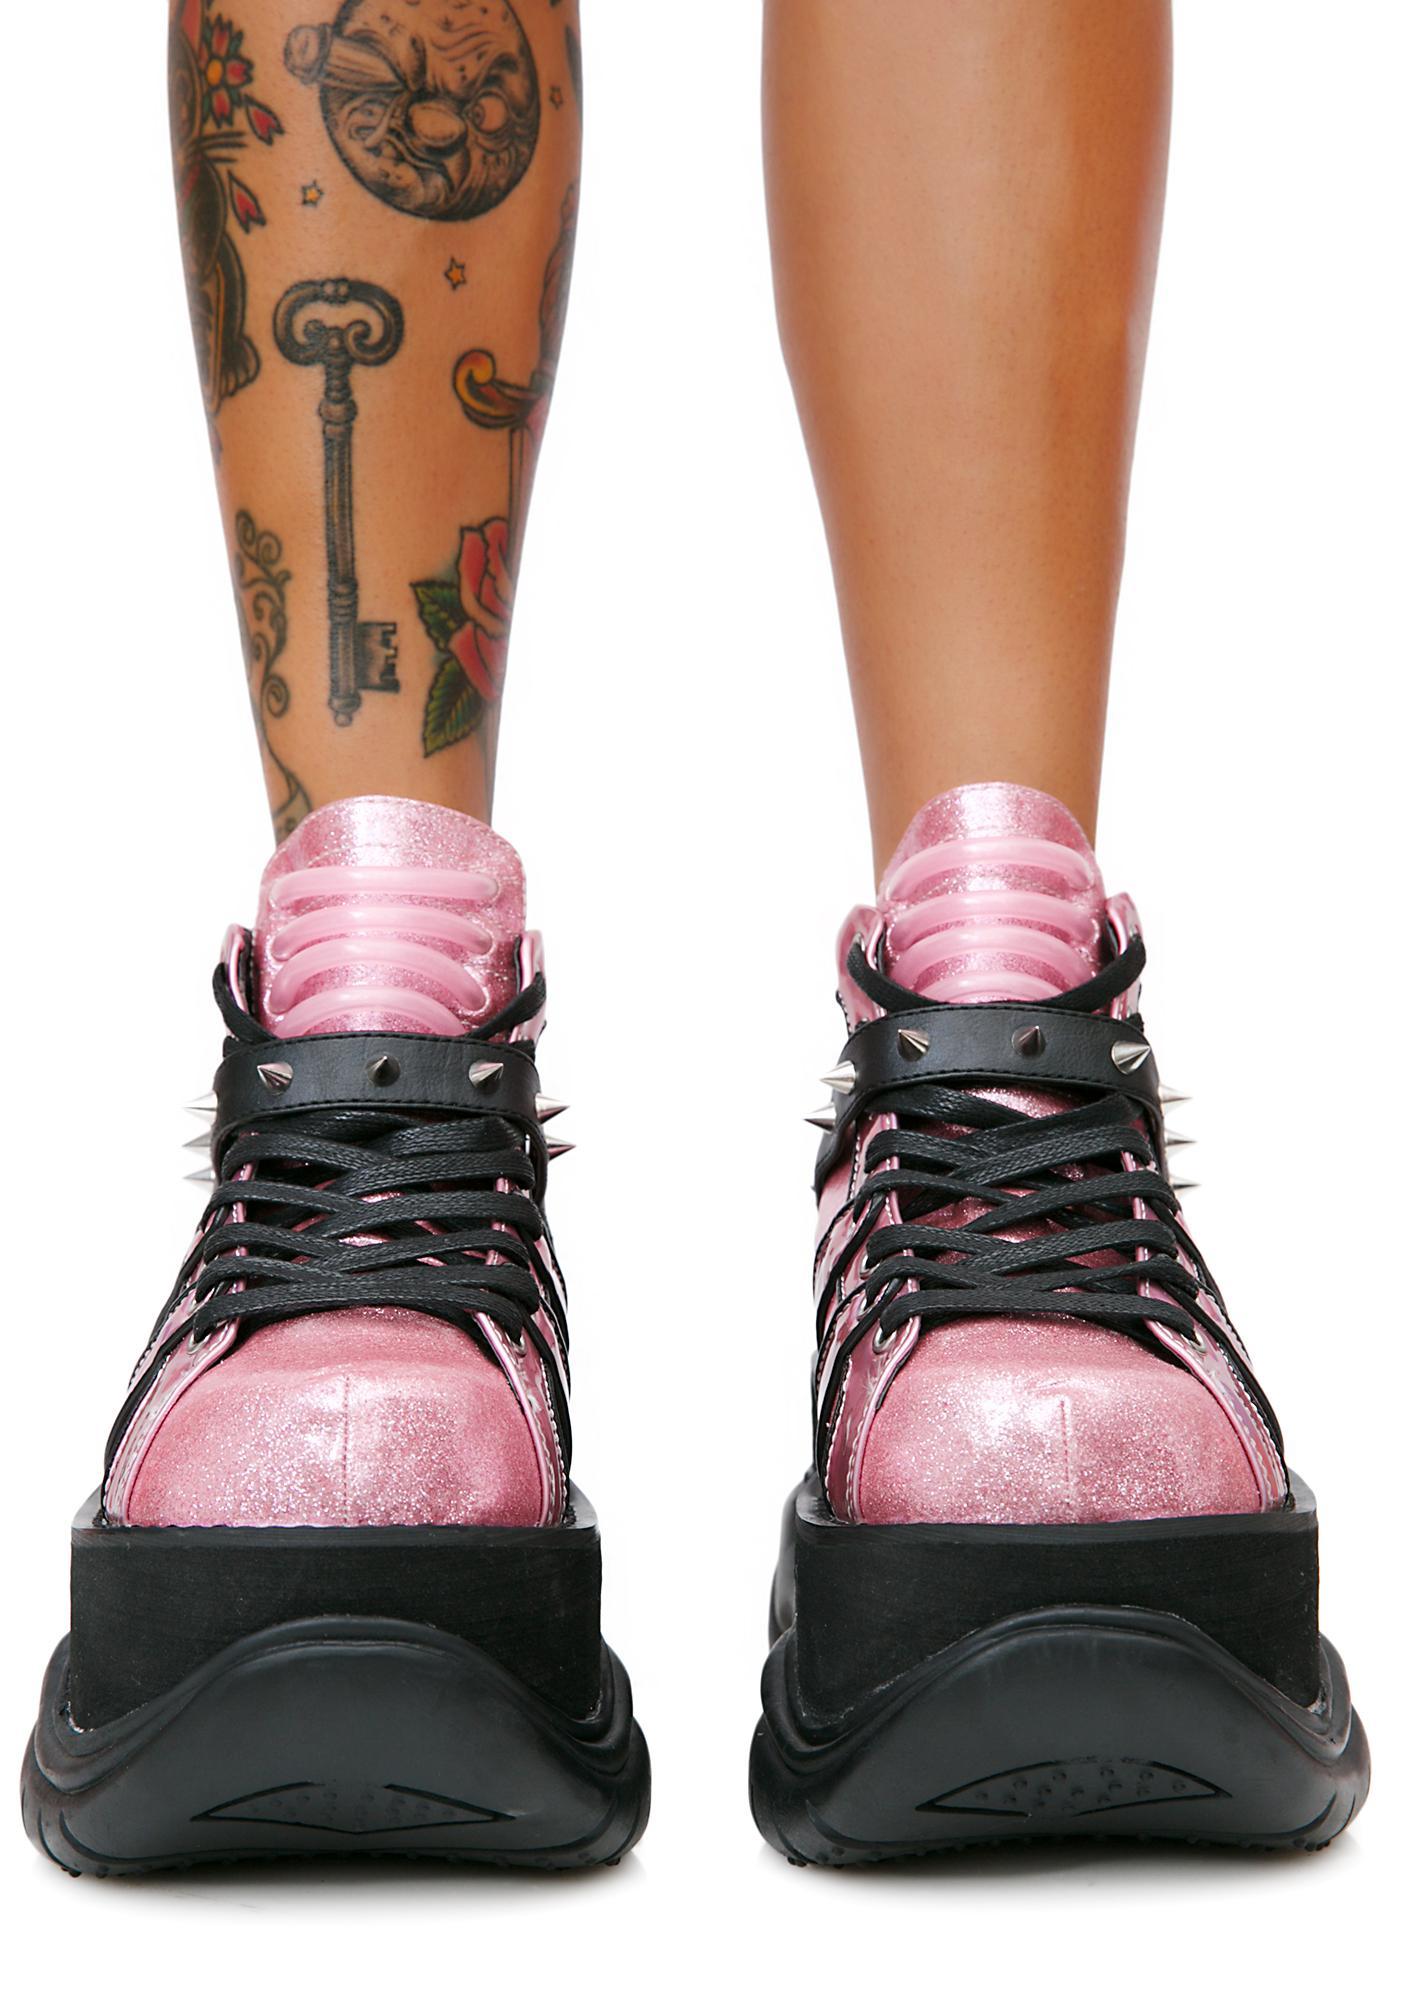 Demonia Candy Machina UV Reactive Platform Sneakers